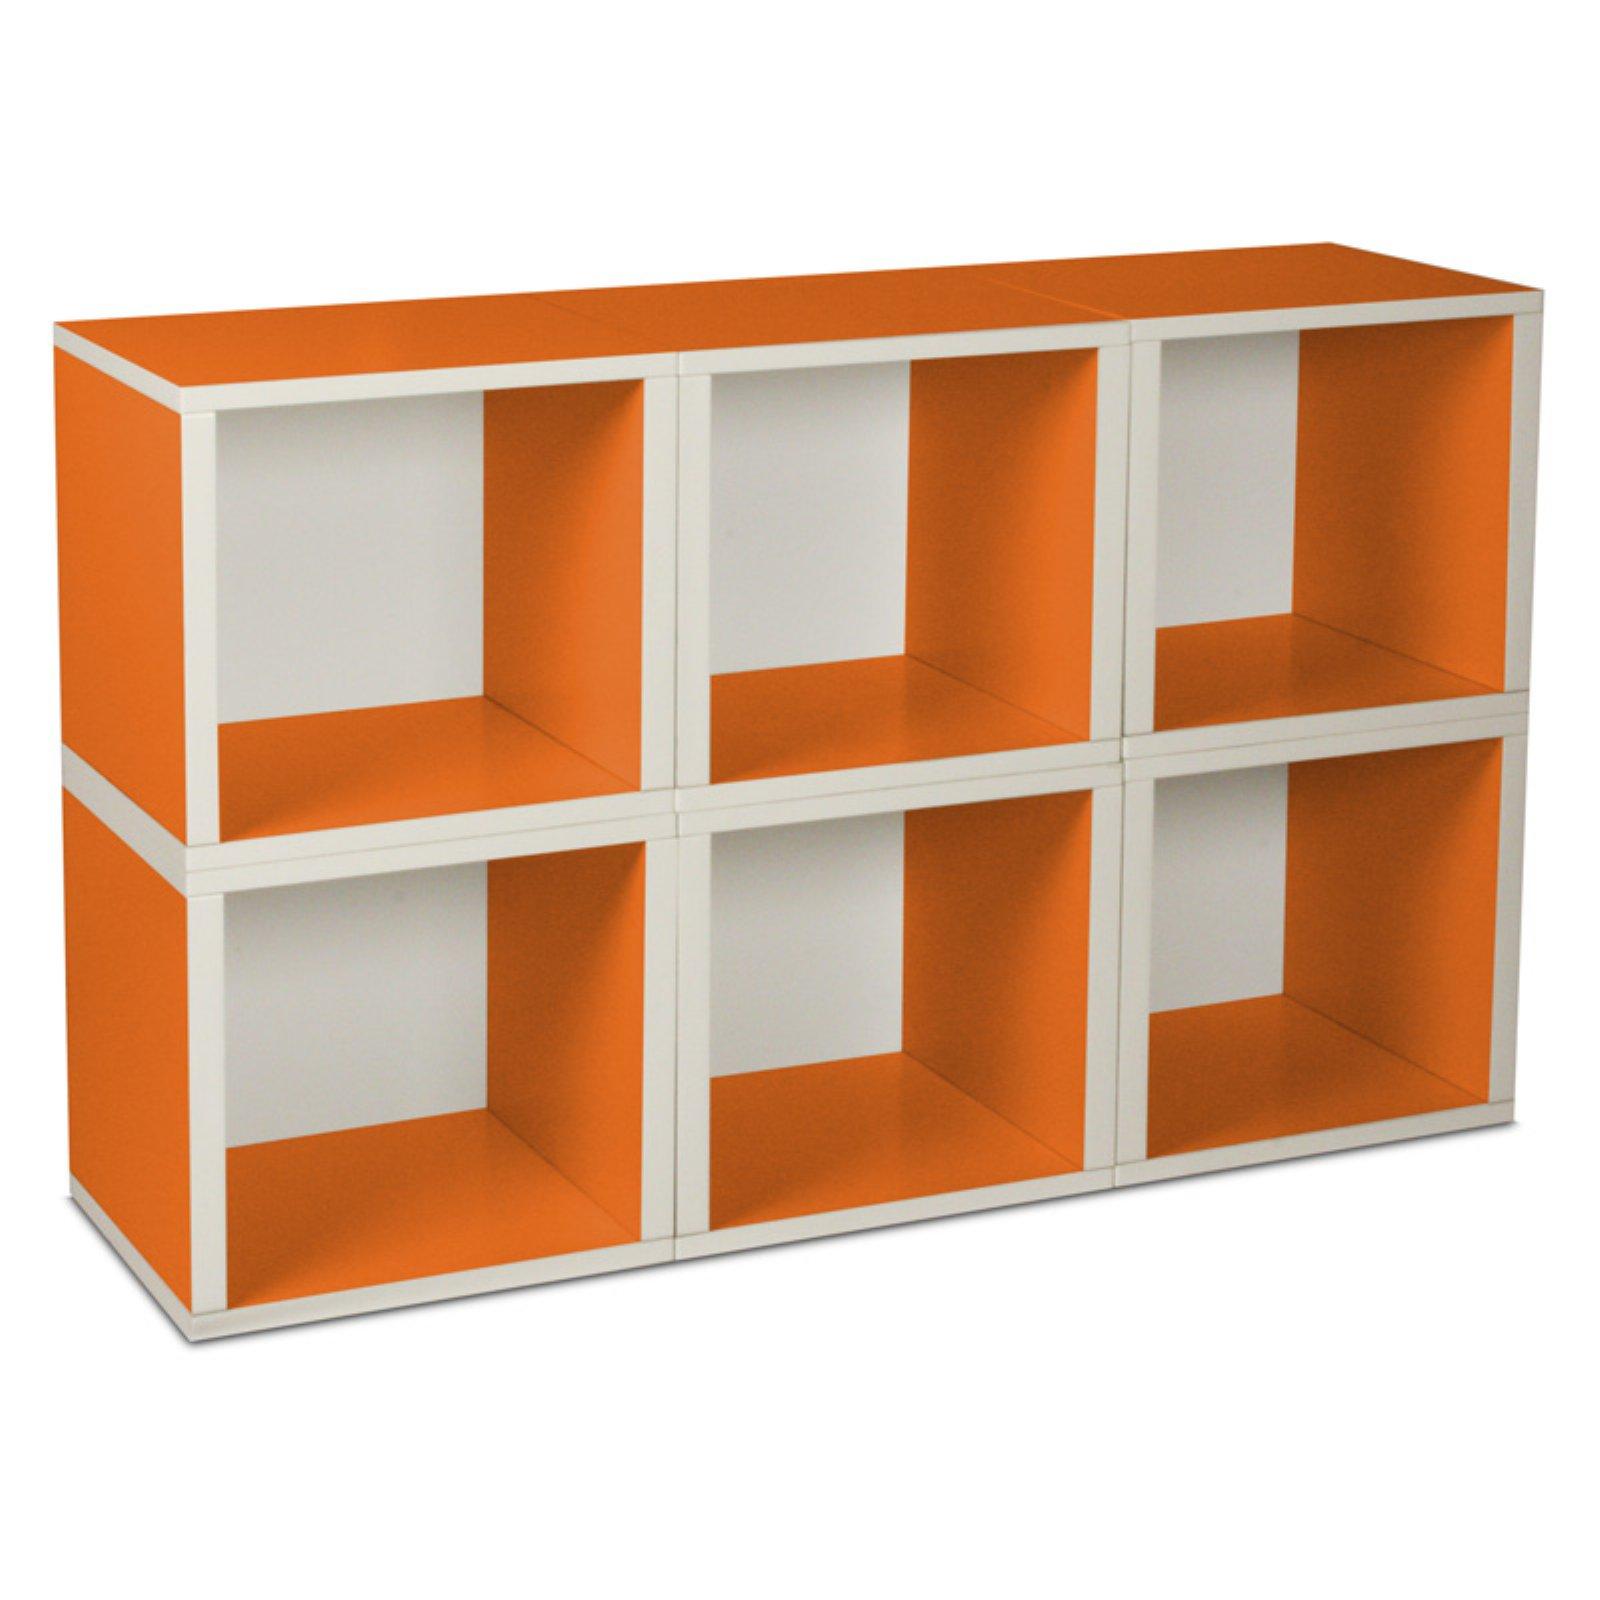 Way Basics Eco Stackable Modular Storage Cubes (6 Pack), Green